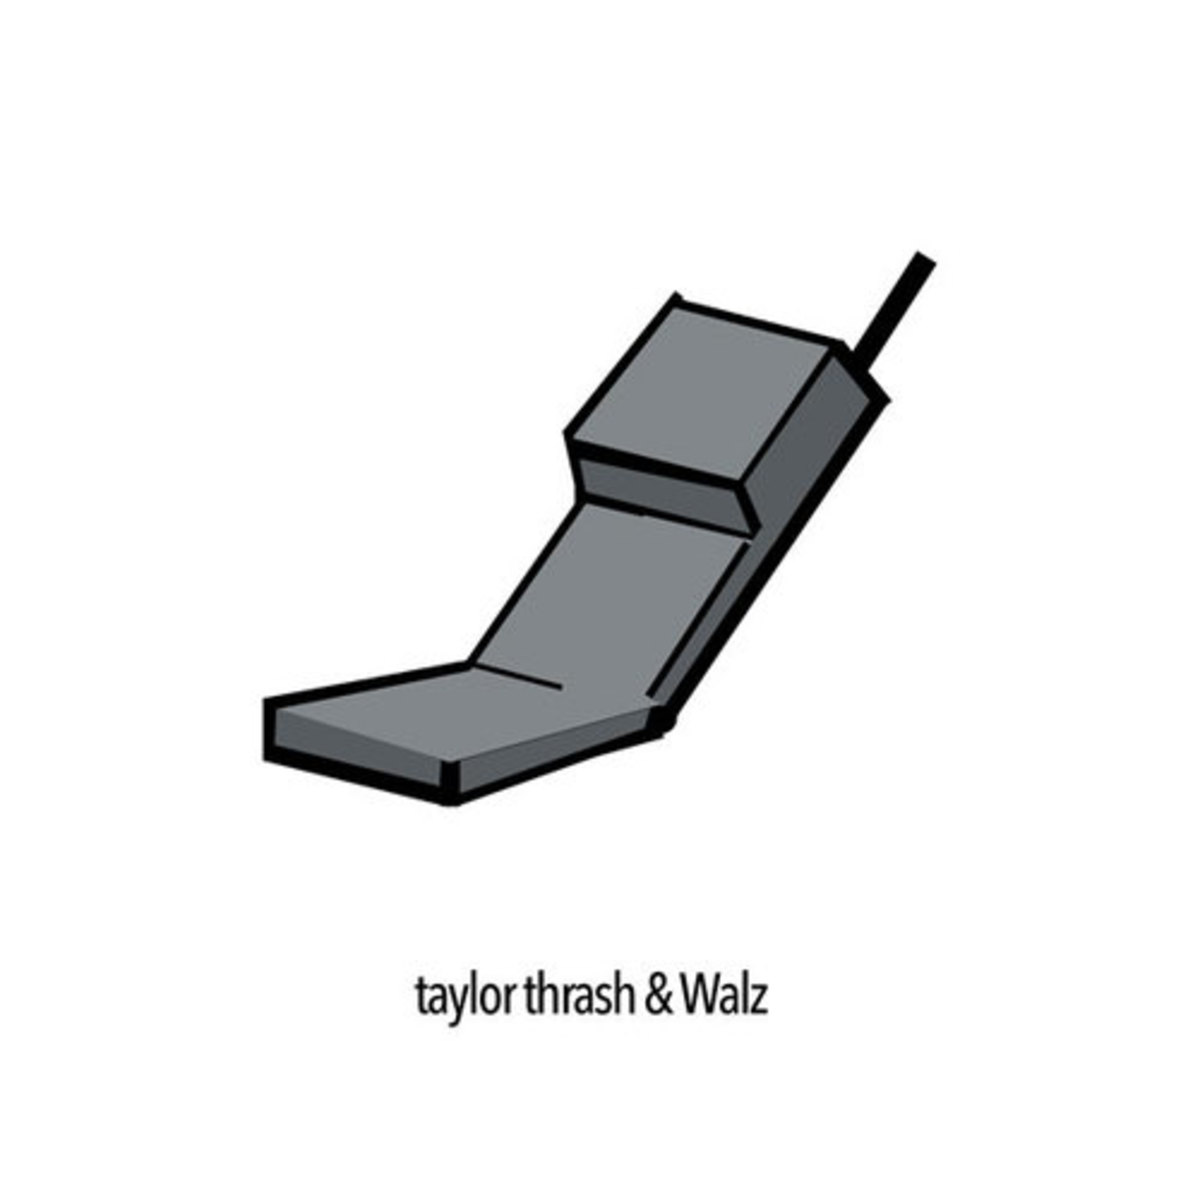 taylor-thrash-calling.jpg